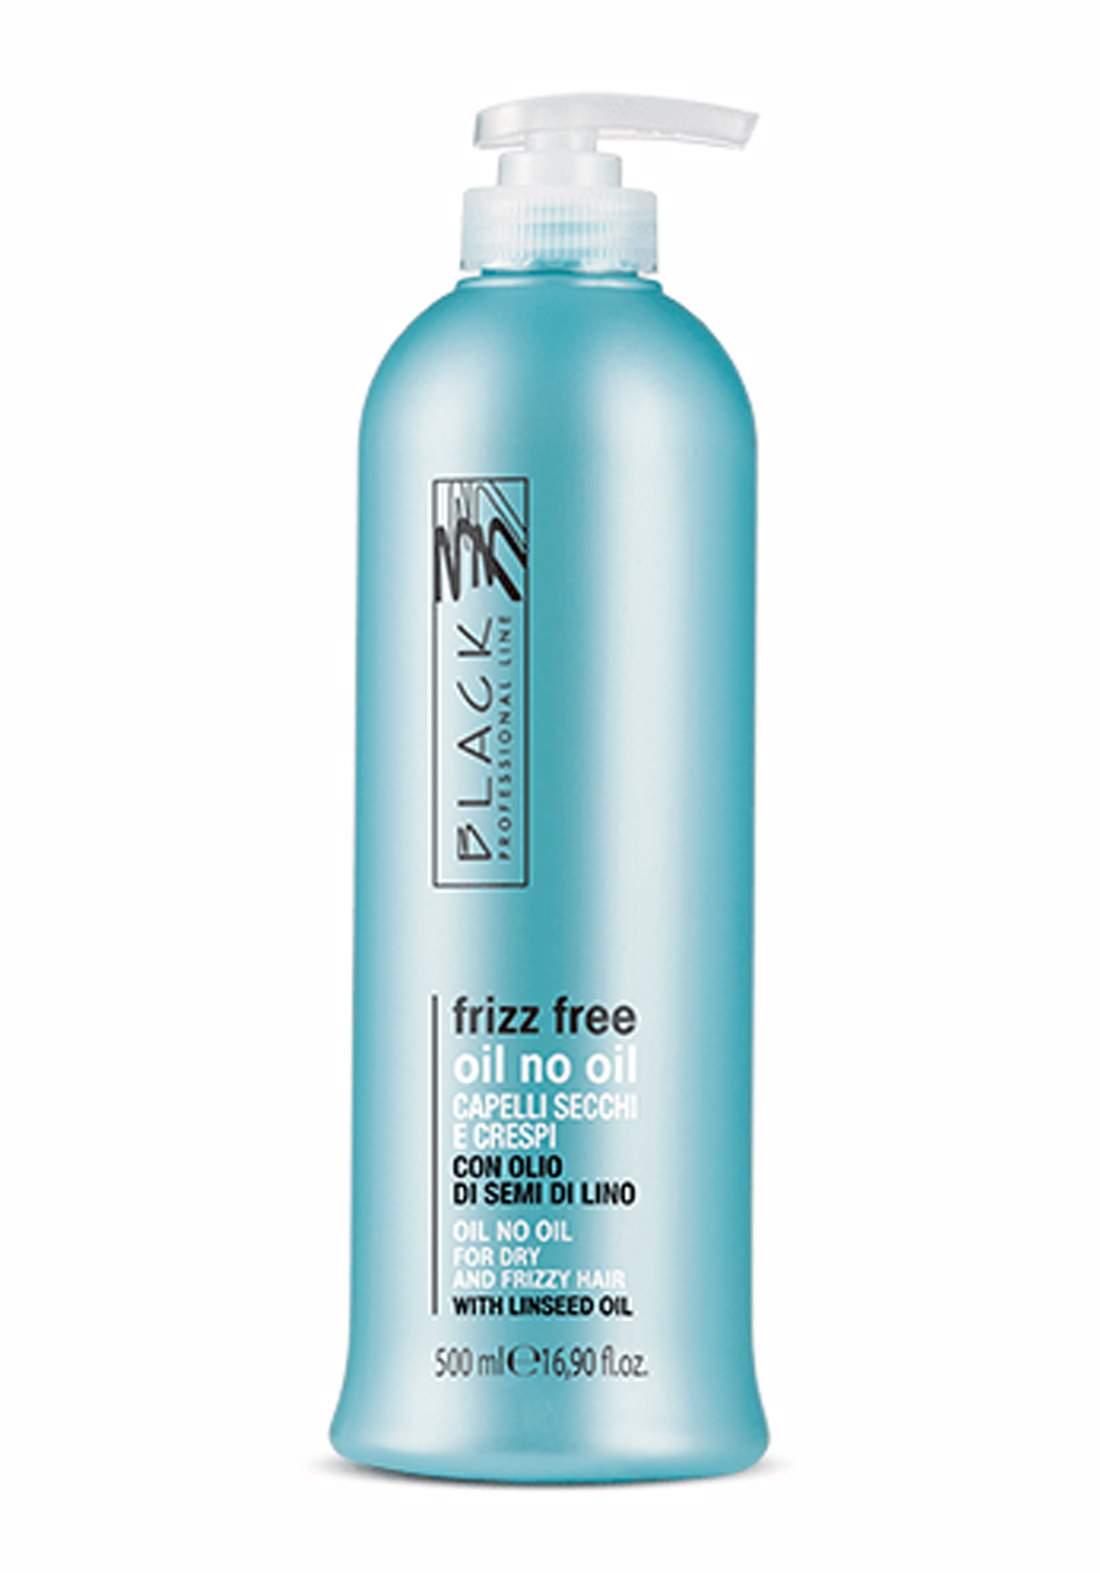 Black Professional Anti-Frizz Oil No Oil For Dry And Frizzy Hair 500ml زيت مضاد للتجعد